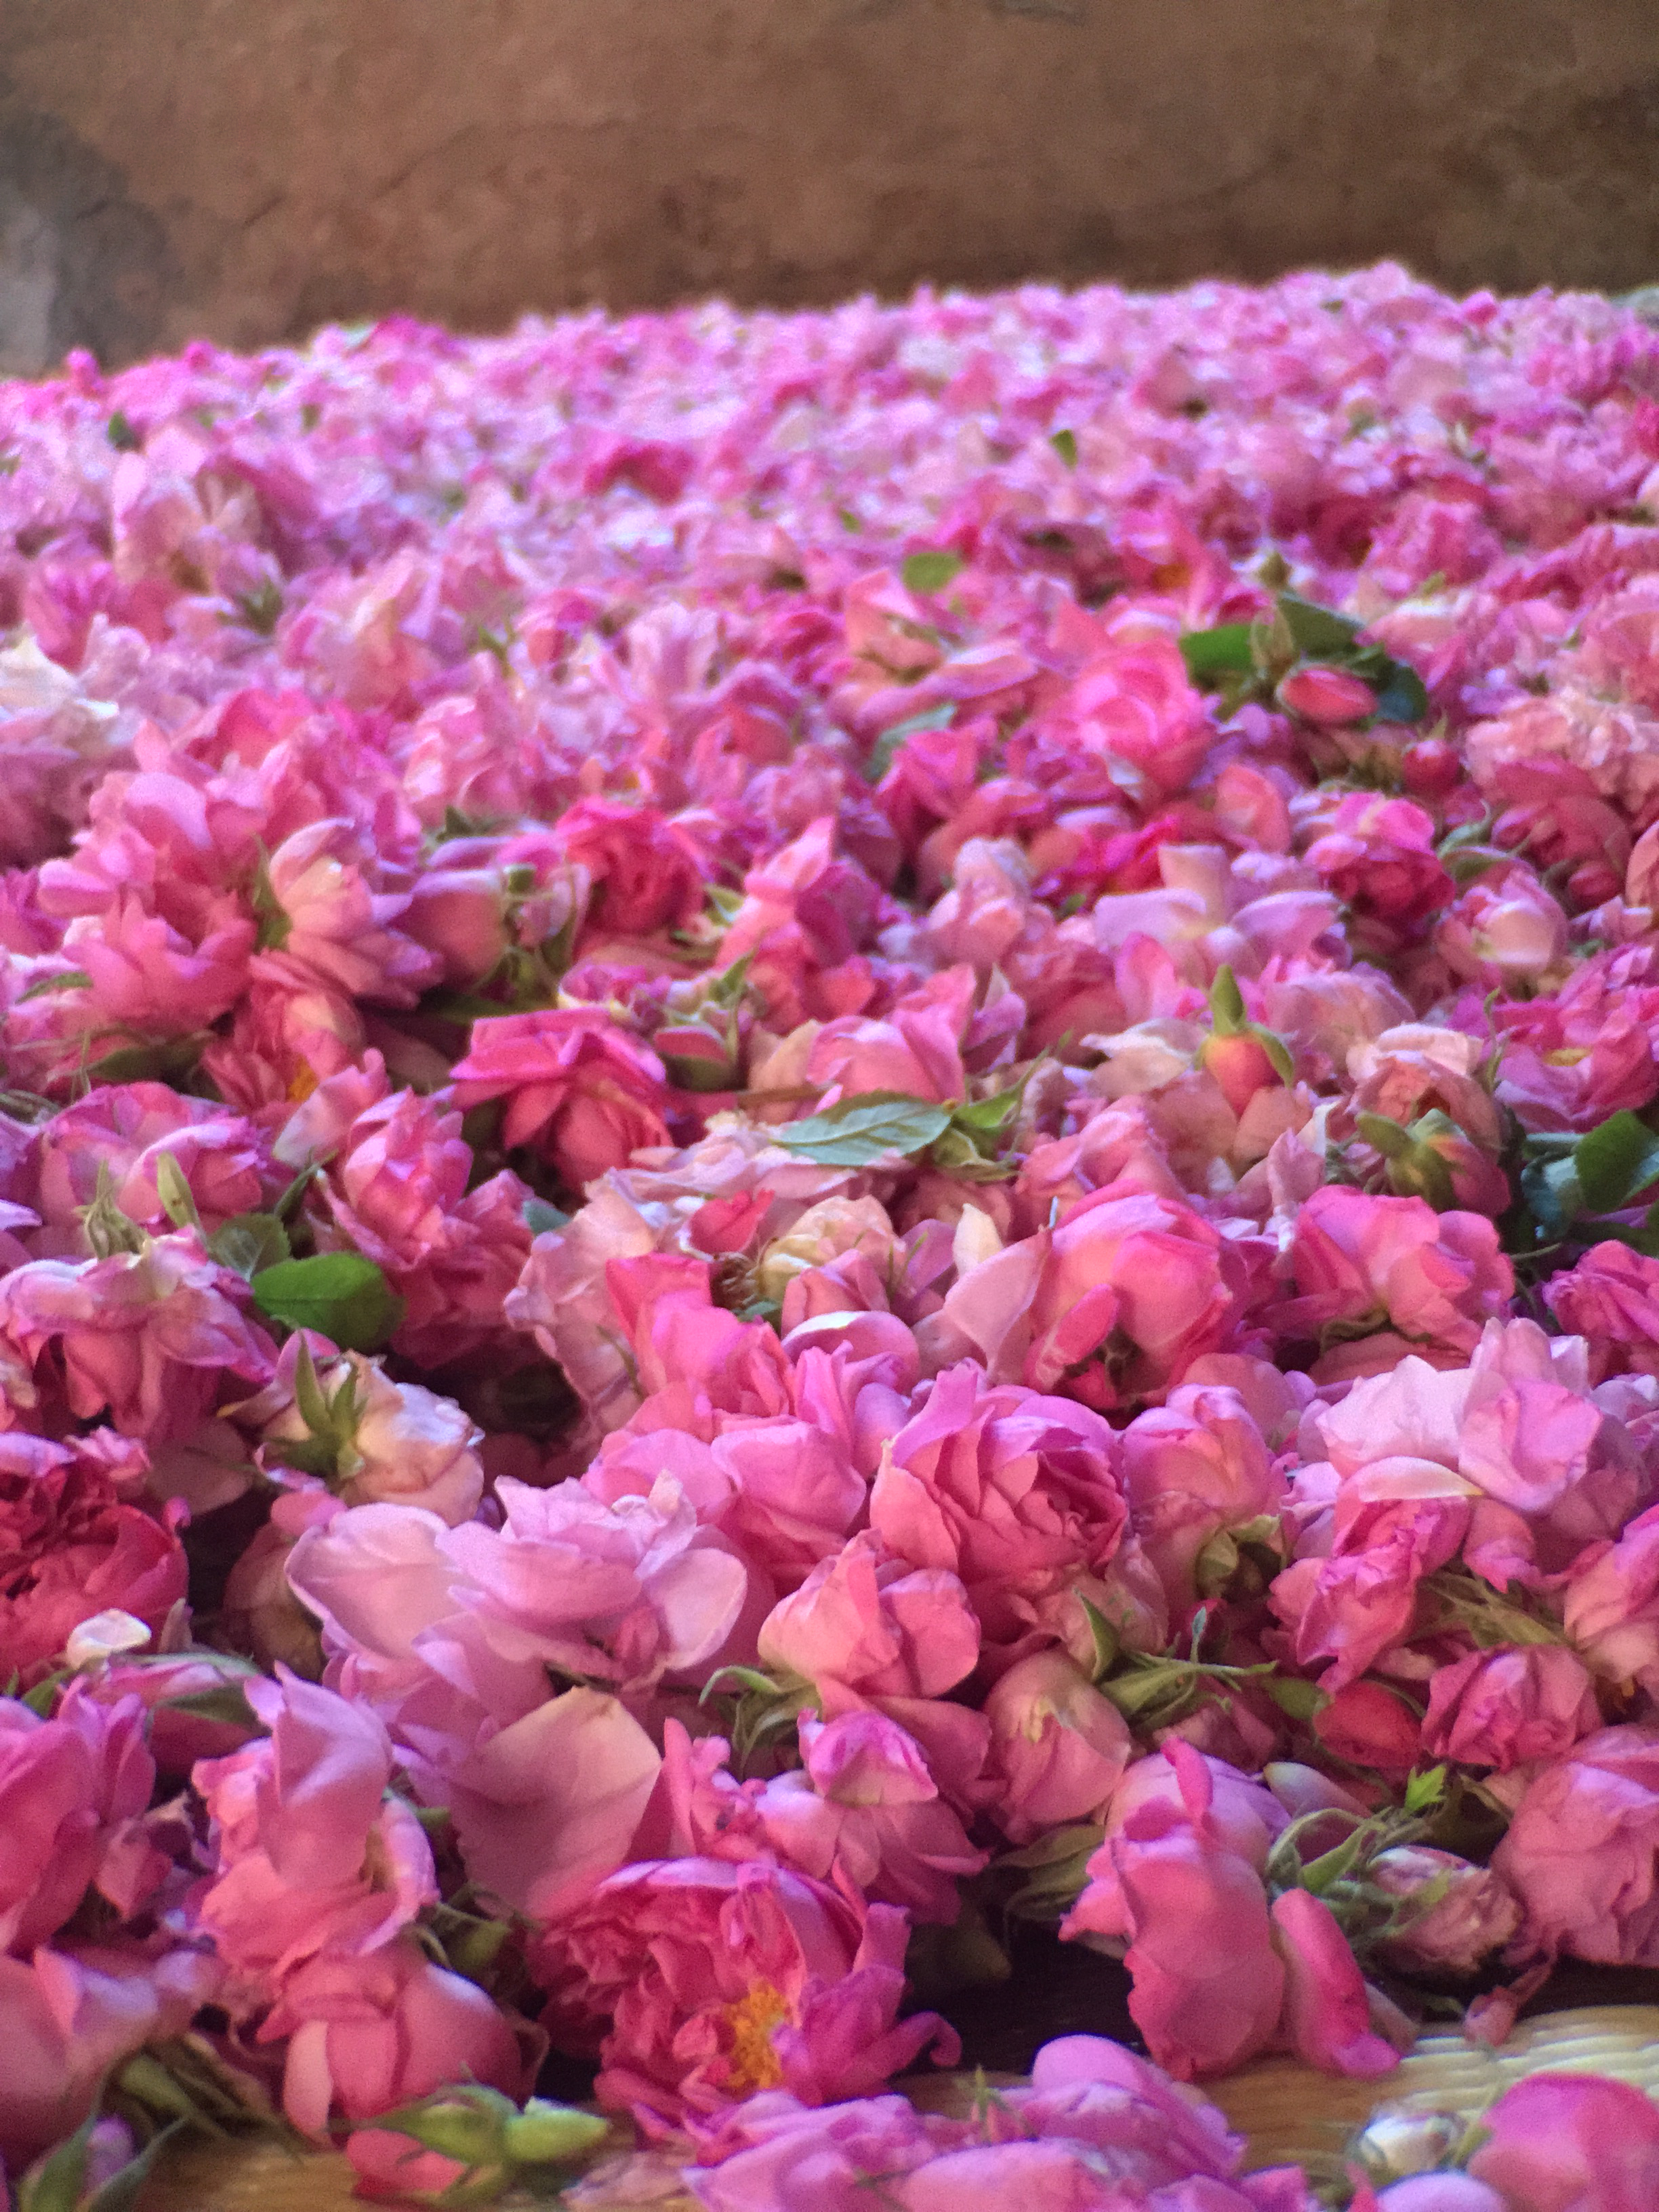 2.pile of roses.jpg